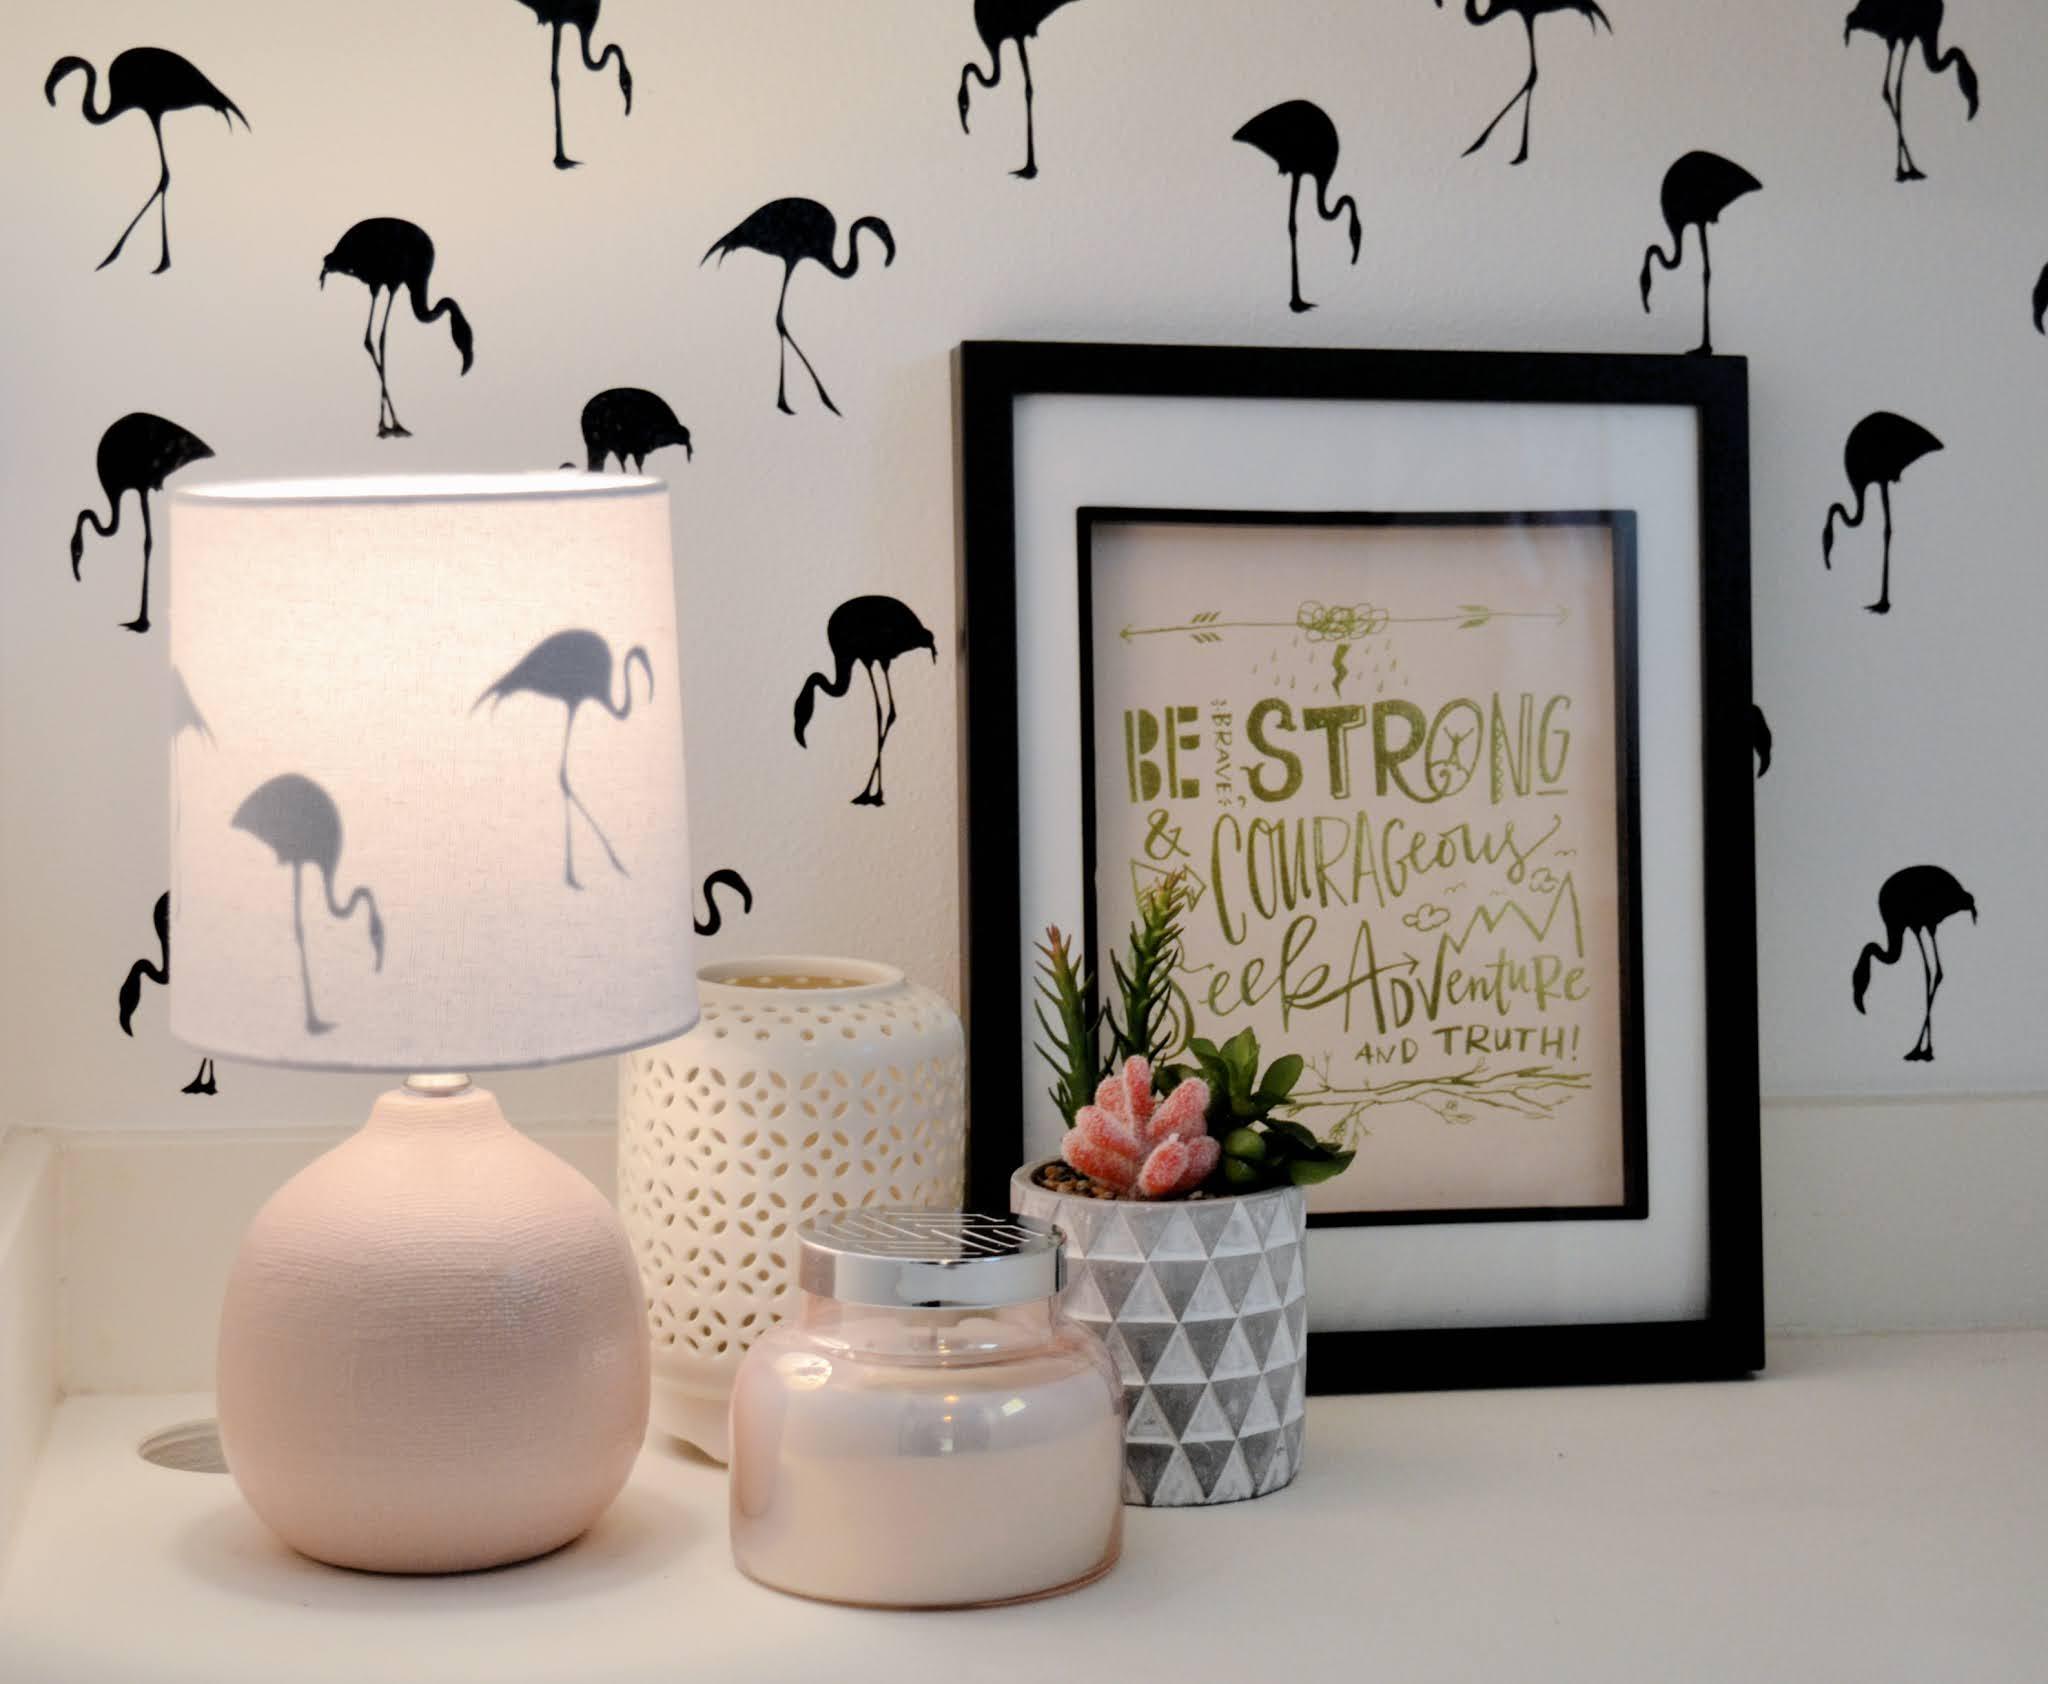 removable wallpaper using Cricut Joy